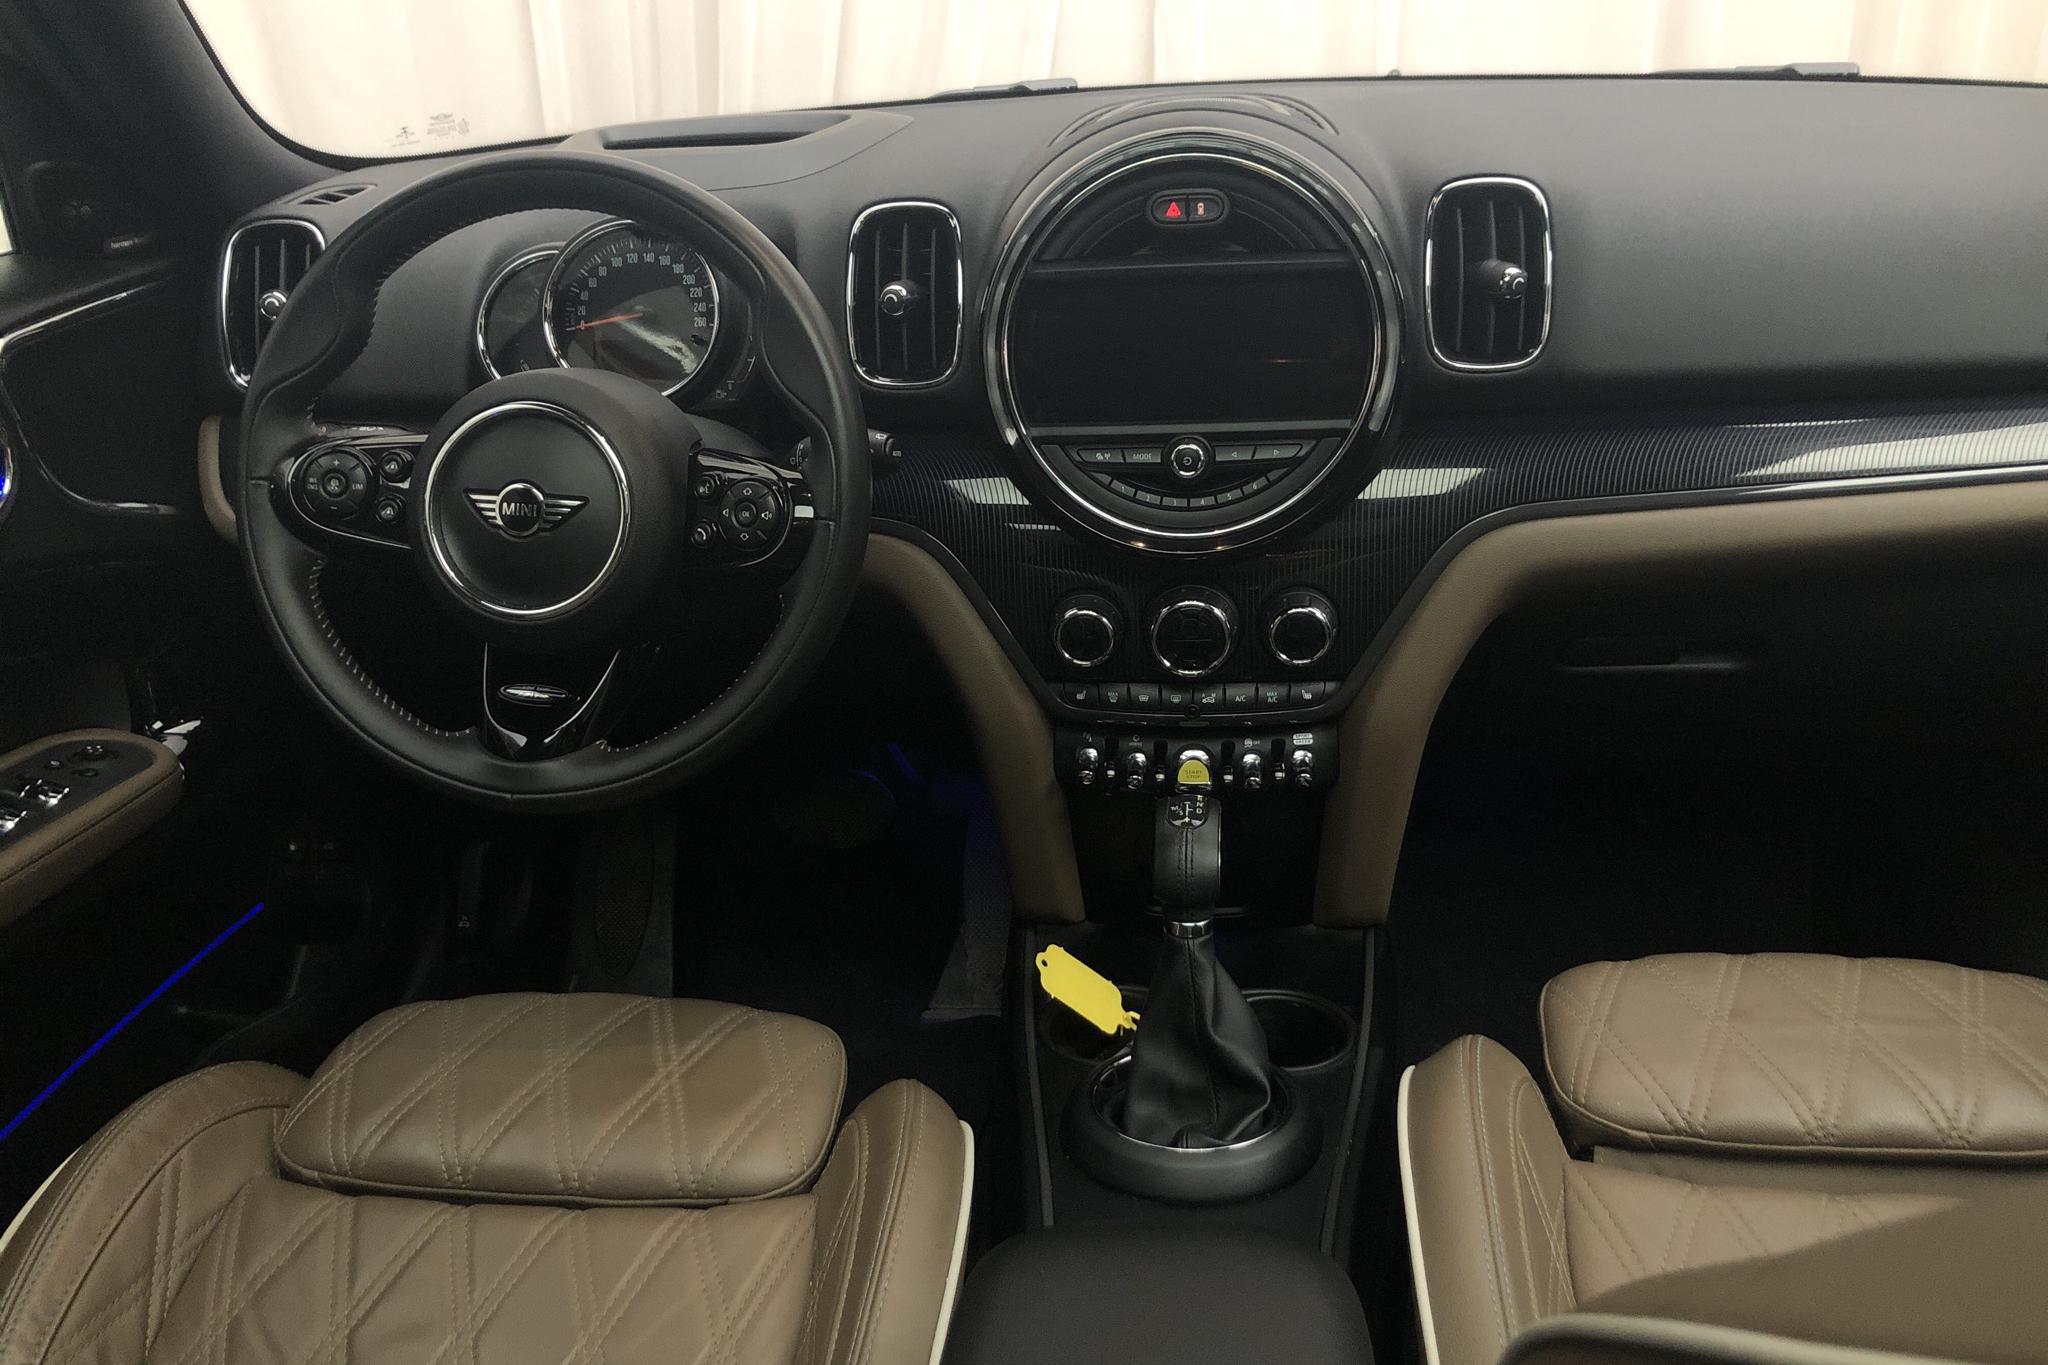 MINI Cooper S E ALL4 Countryman, F60 (224hk) - 5 035 mil - Automat - grå - 2019